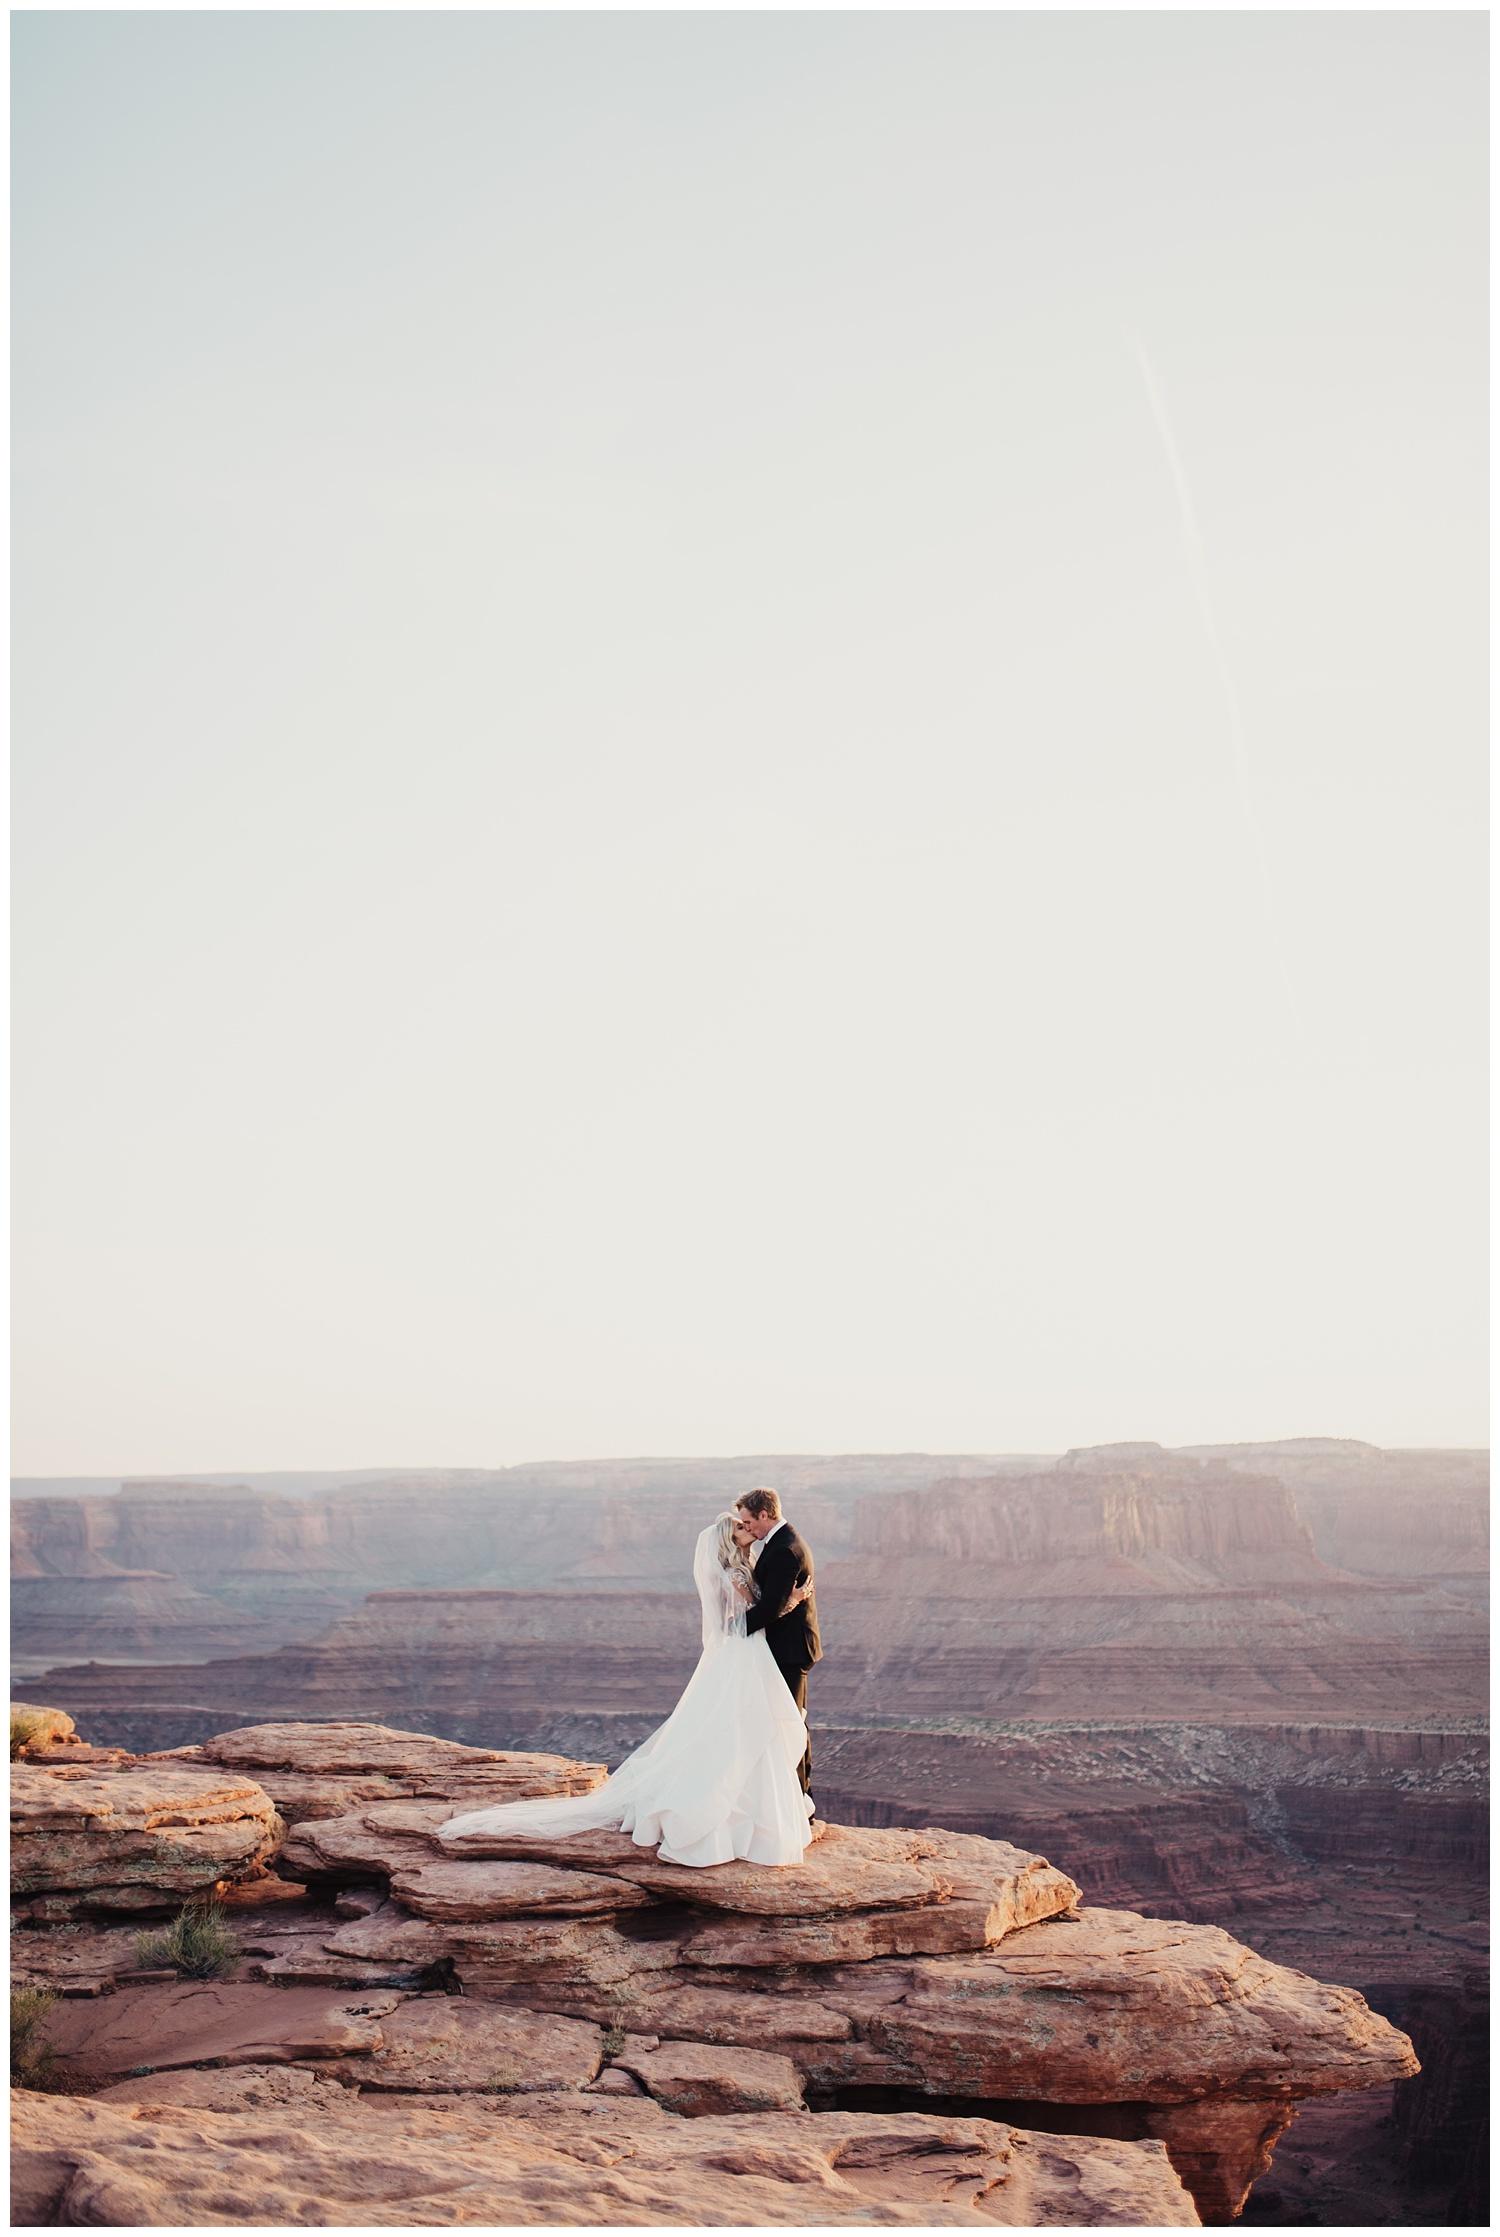 edenstraderphoto-weddingphotographer_0824.jpg